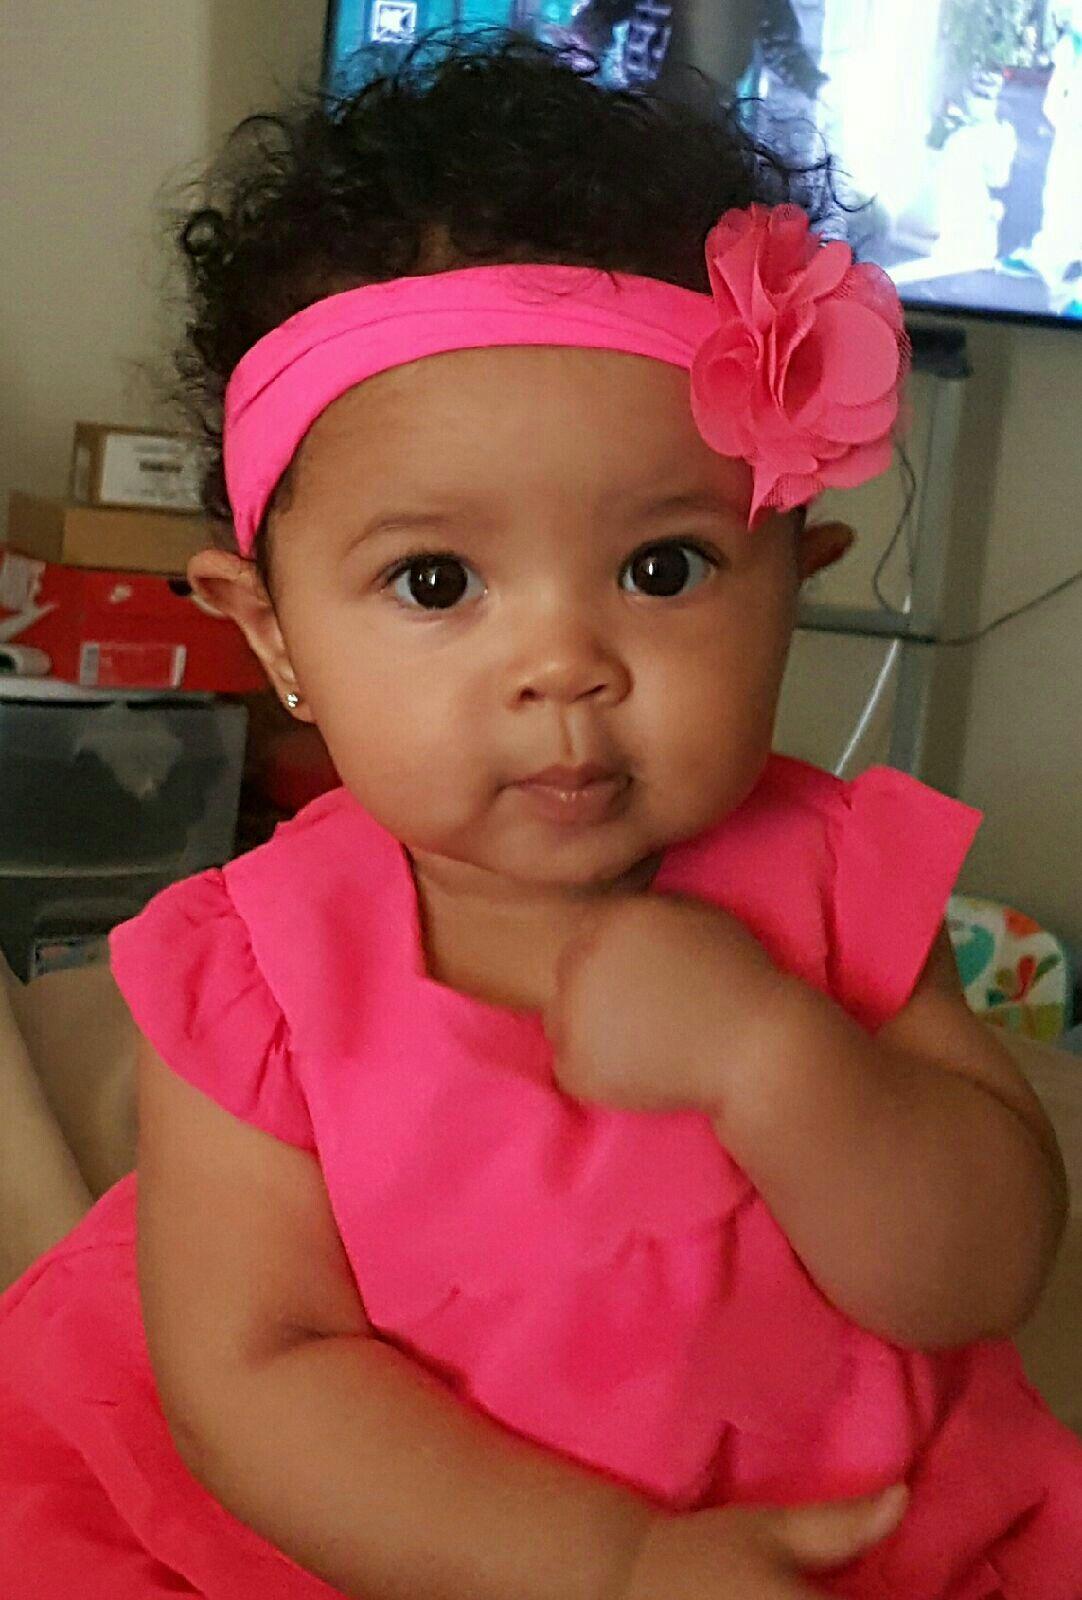 22 Touching Images of Beautiful Black Newborns   Babies, Baby ...